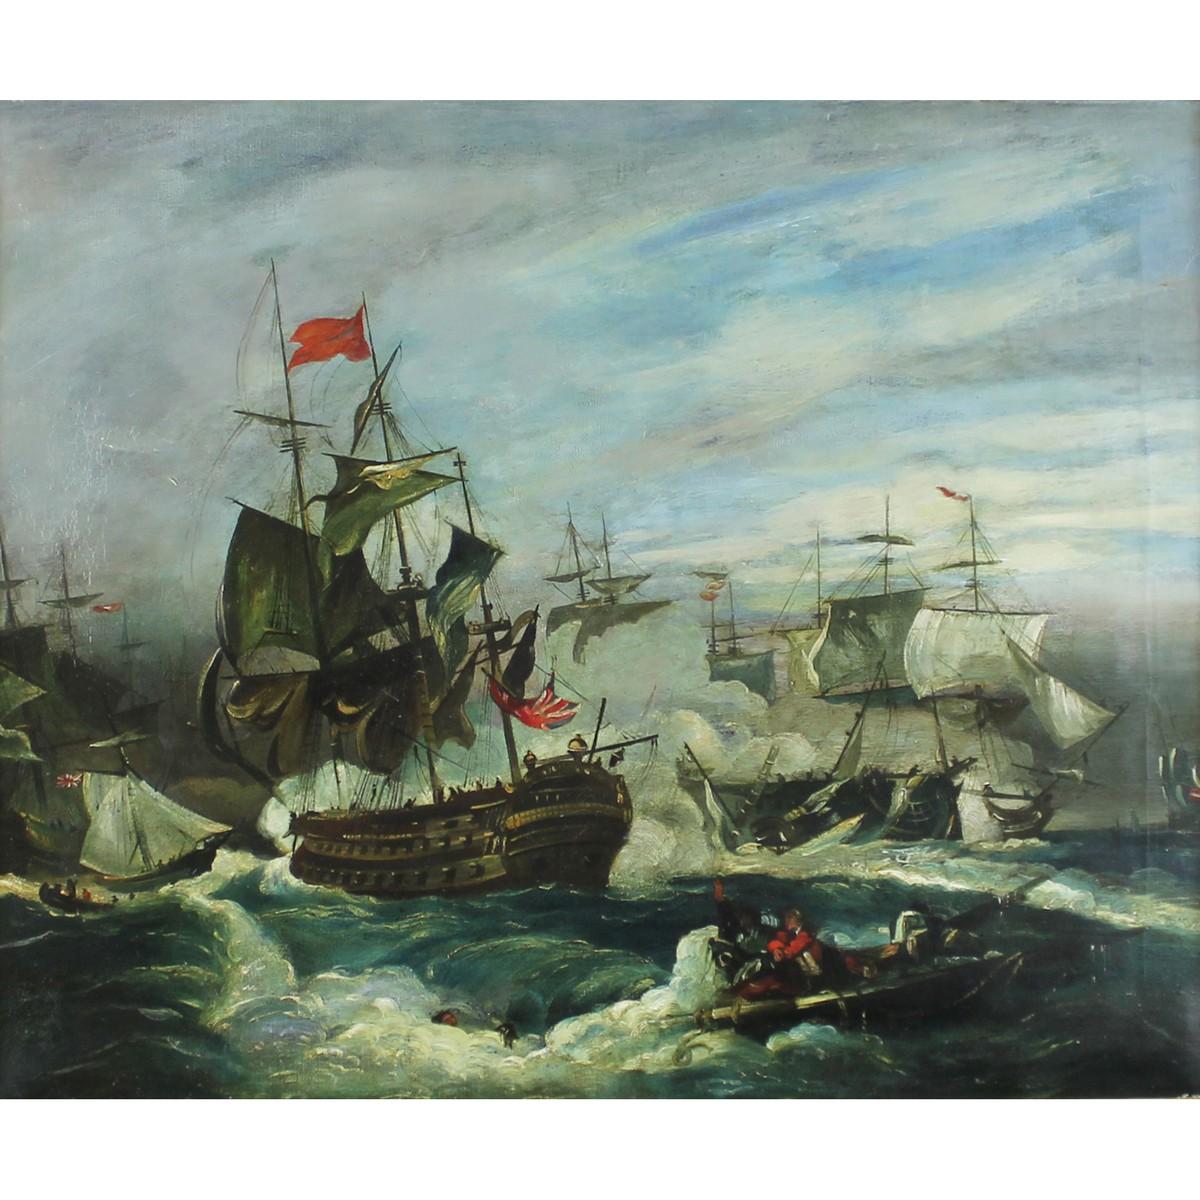 Lot 35 - Early 19th century Naval Battle Maritime scene.